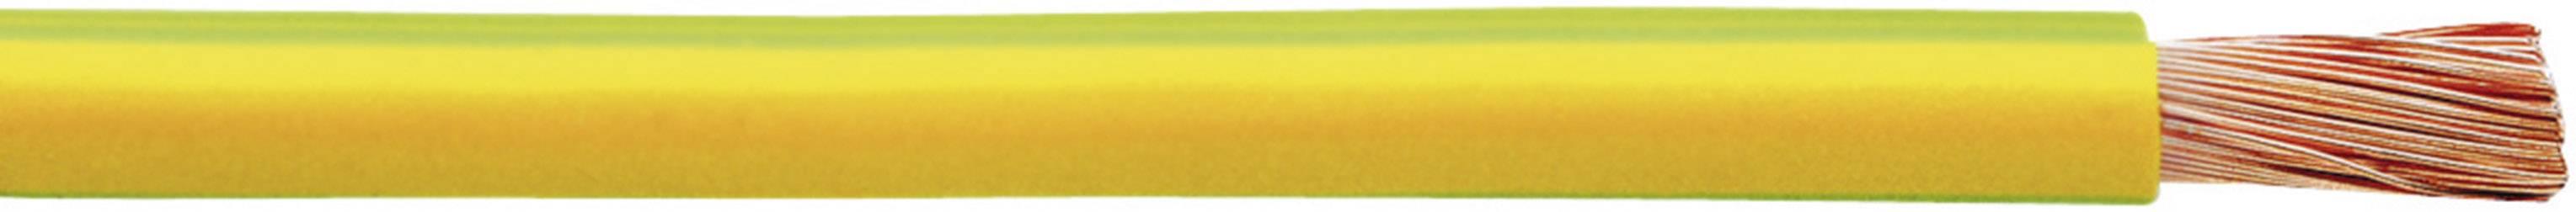 Opletenie / lanko Faber Kabel 040056 H07V-K, 1 x 2.50 mm², vonkajší Ø 3.40 mm, 100 m, sivá